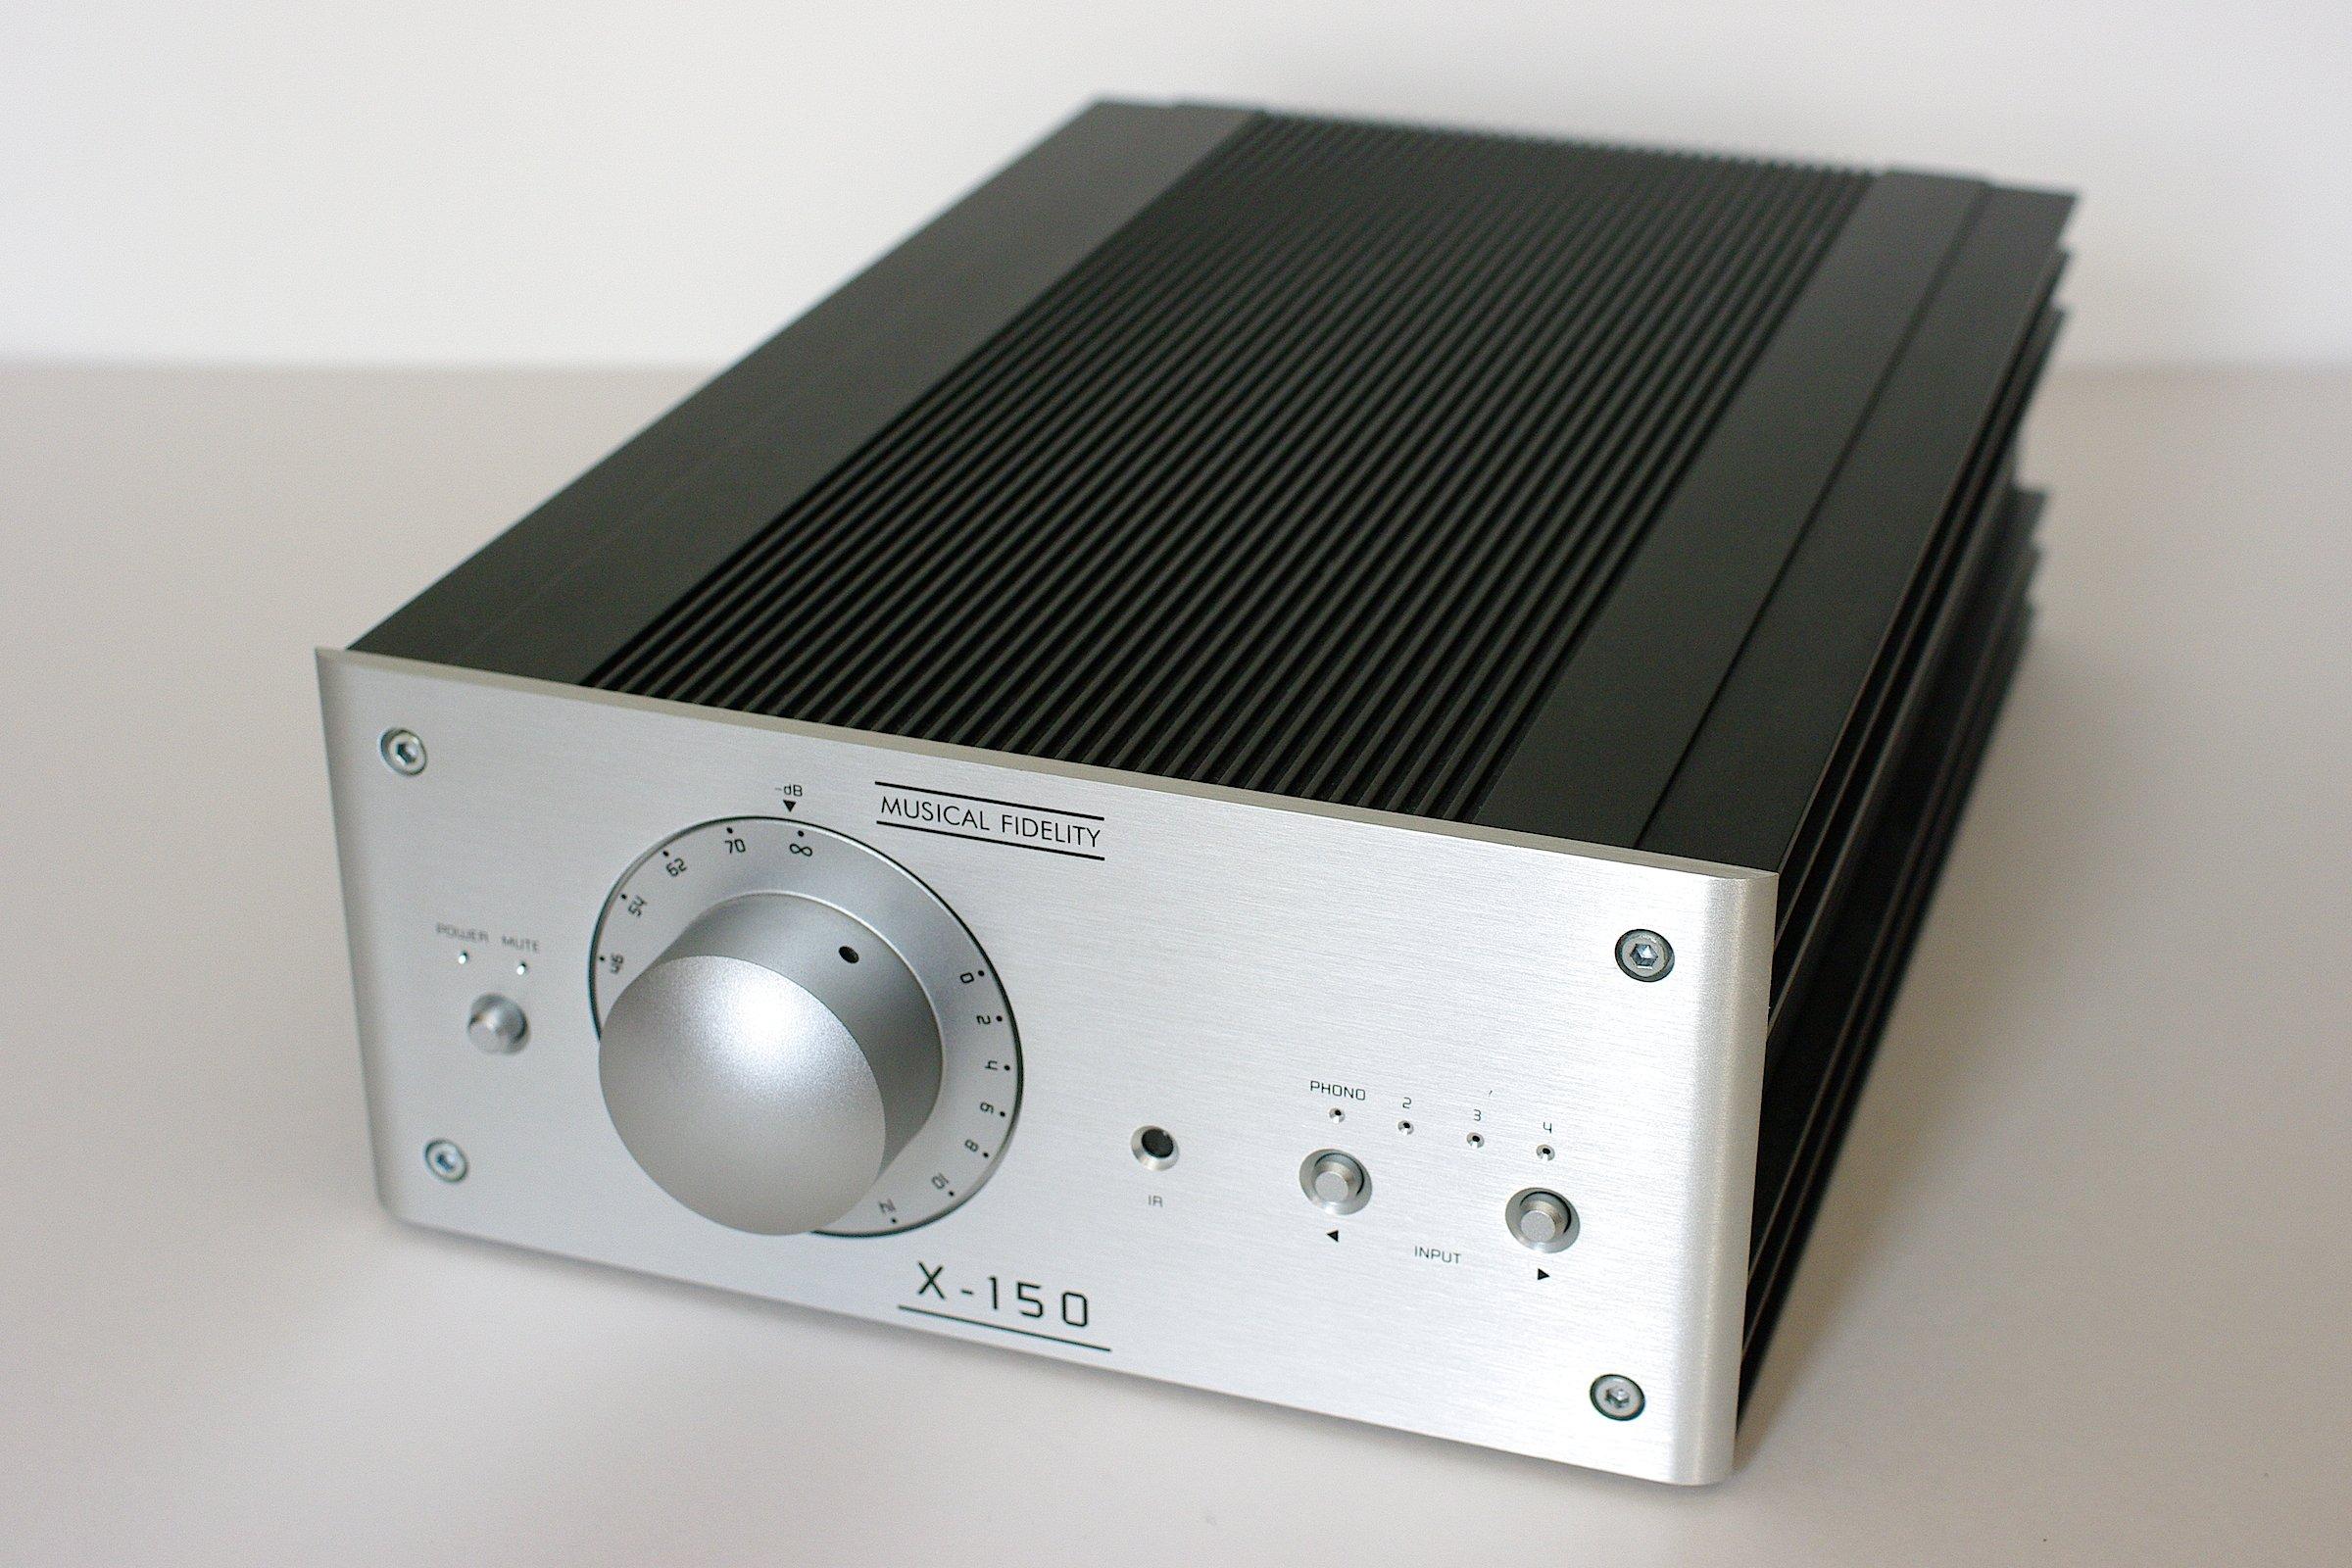 Musical Fidelity X-150